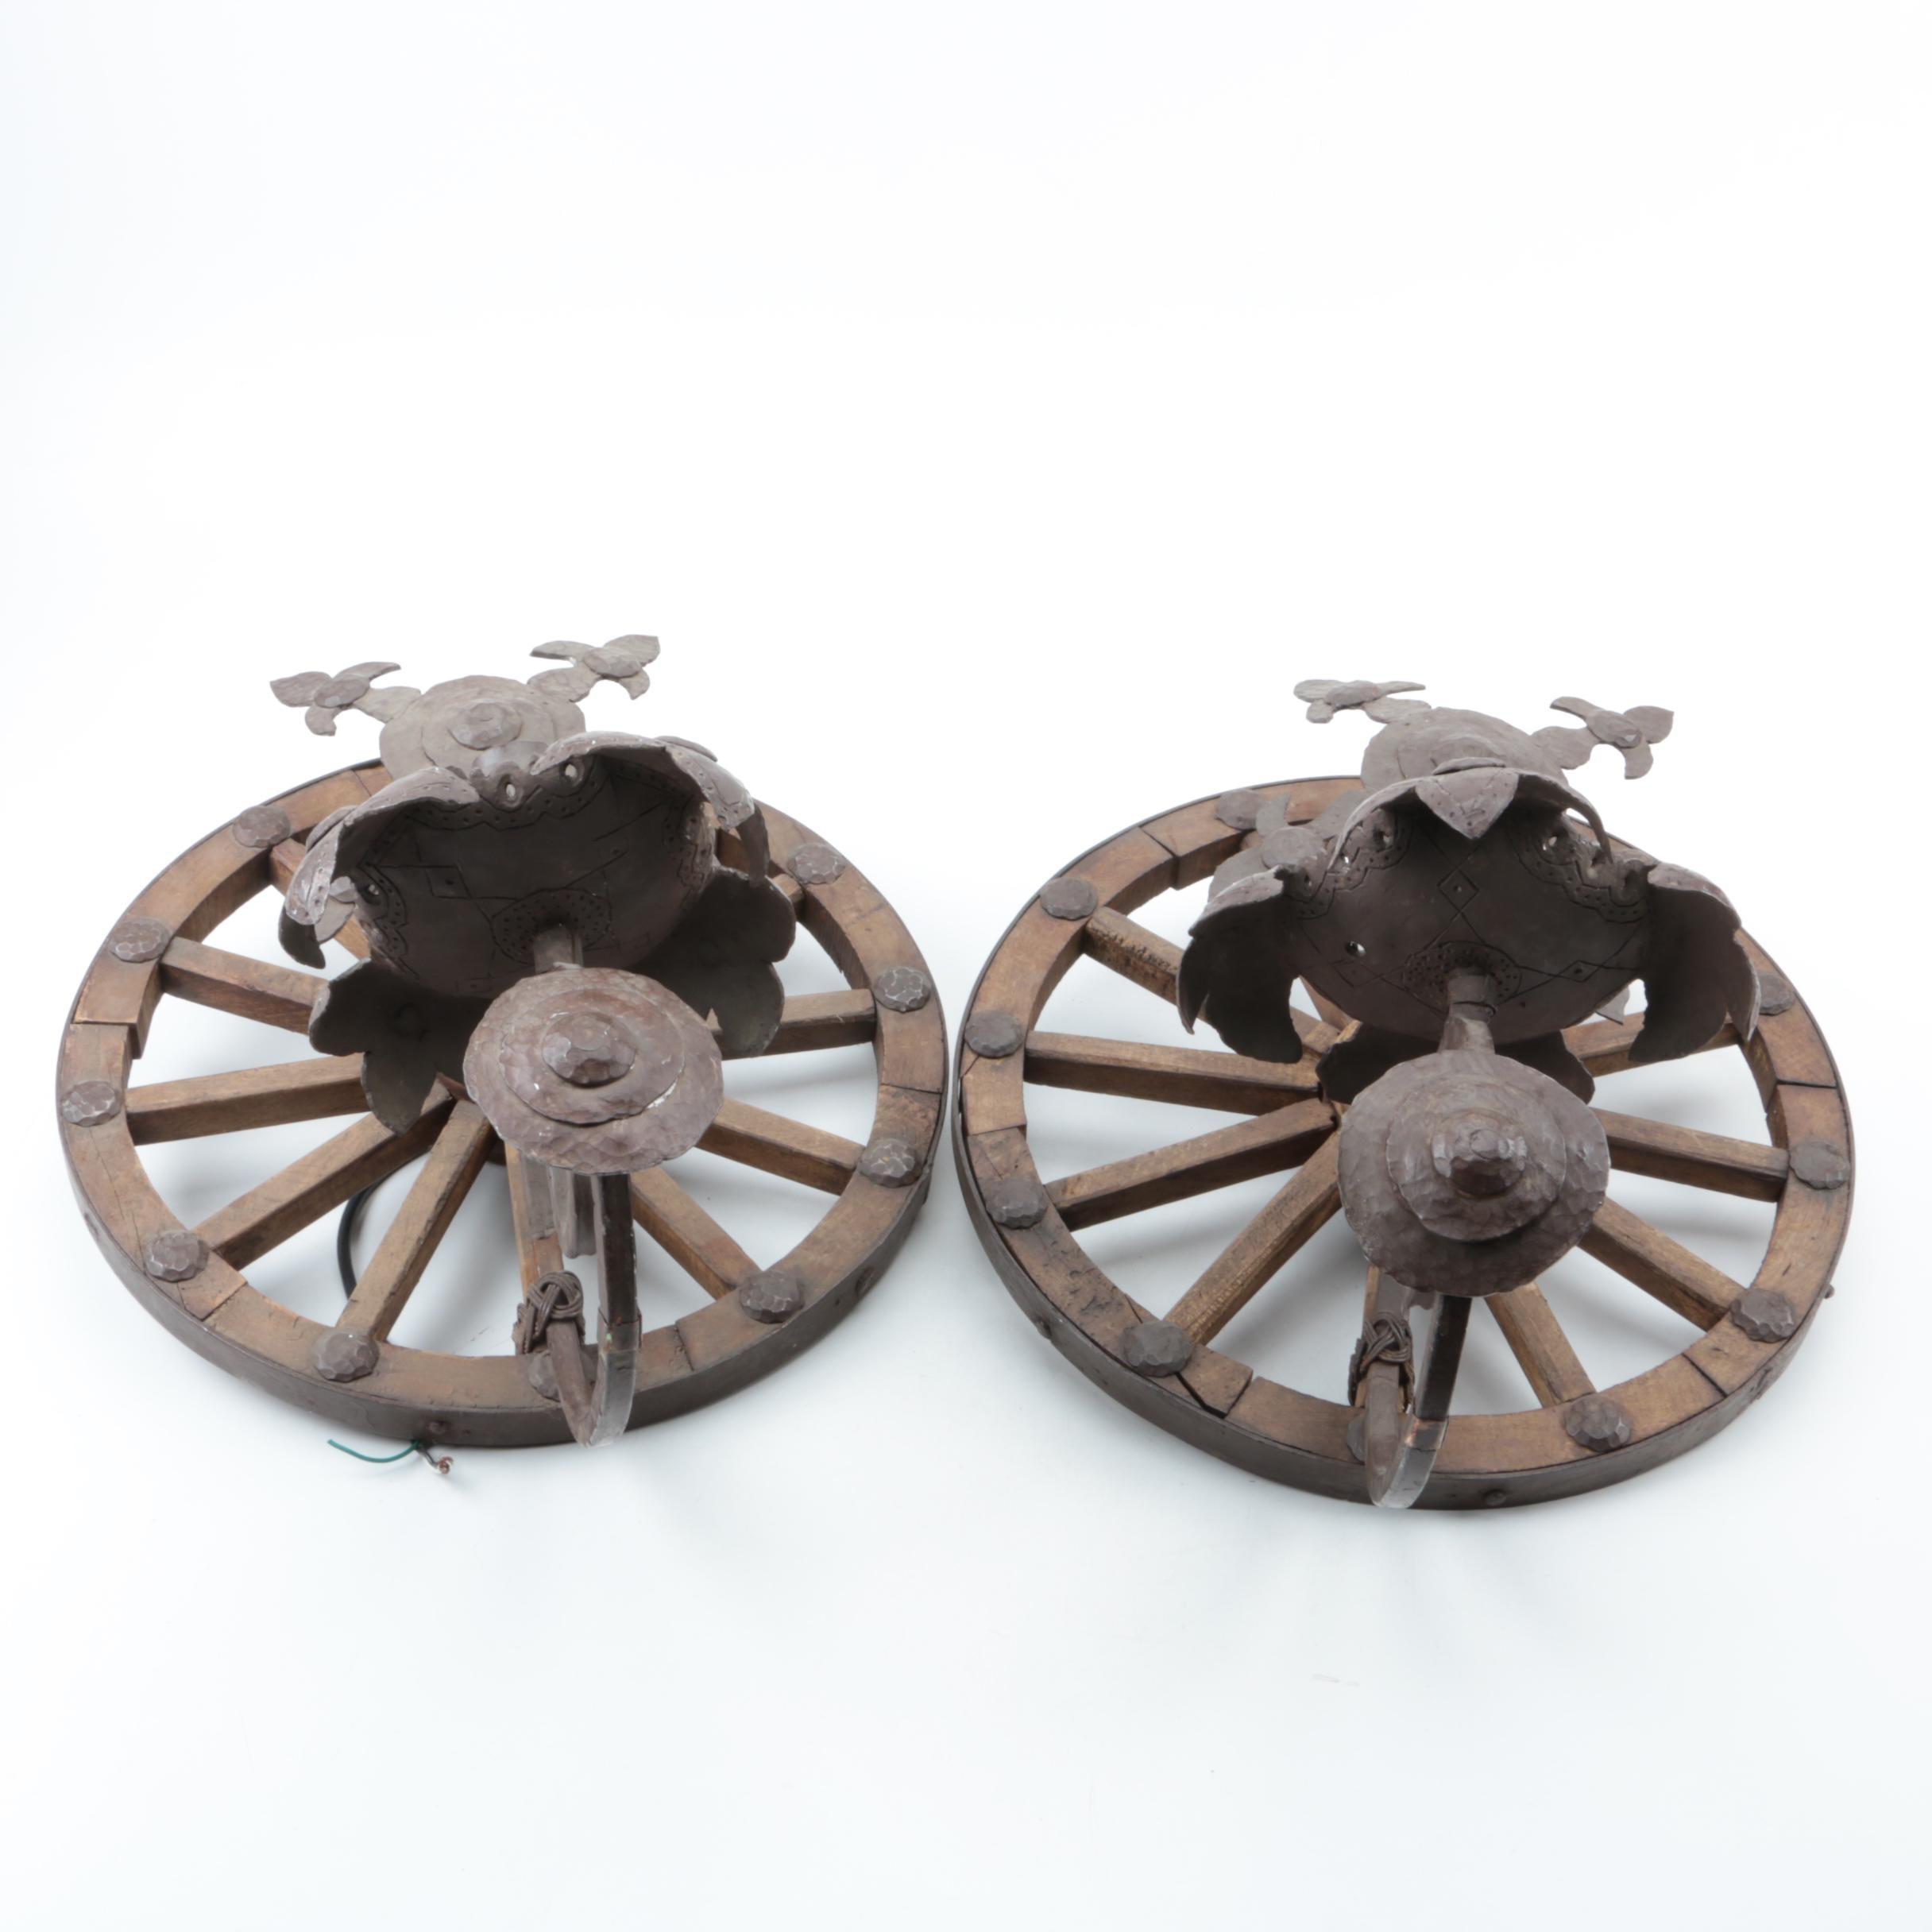 Wagon Wheel Wall Sconces